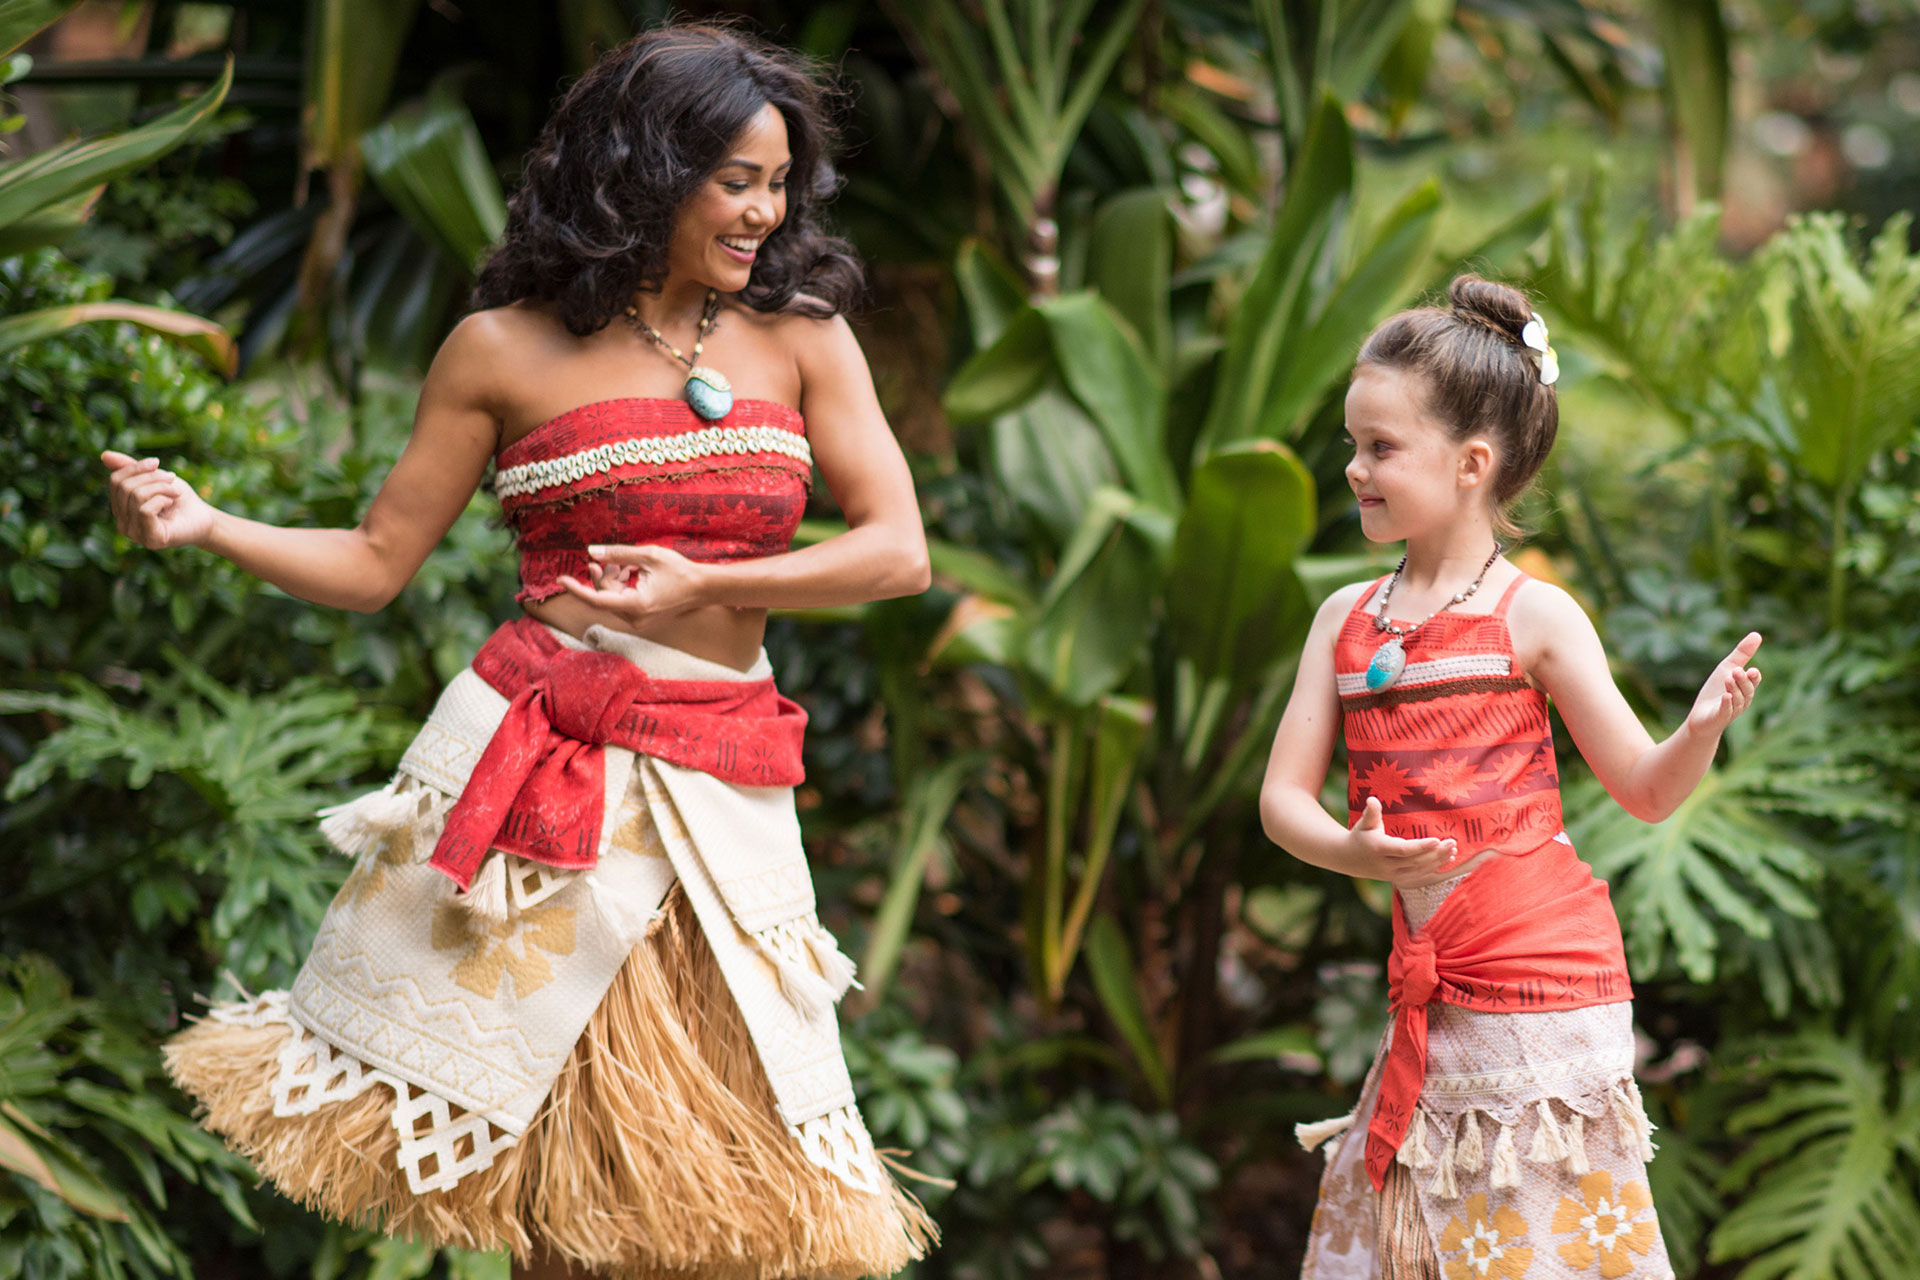 Learning to Hula Dance at Aulani, A Disney Resort & Spa; Courtesy of Aulani, A Disney Resort & Spa